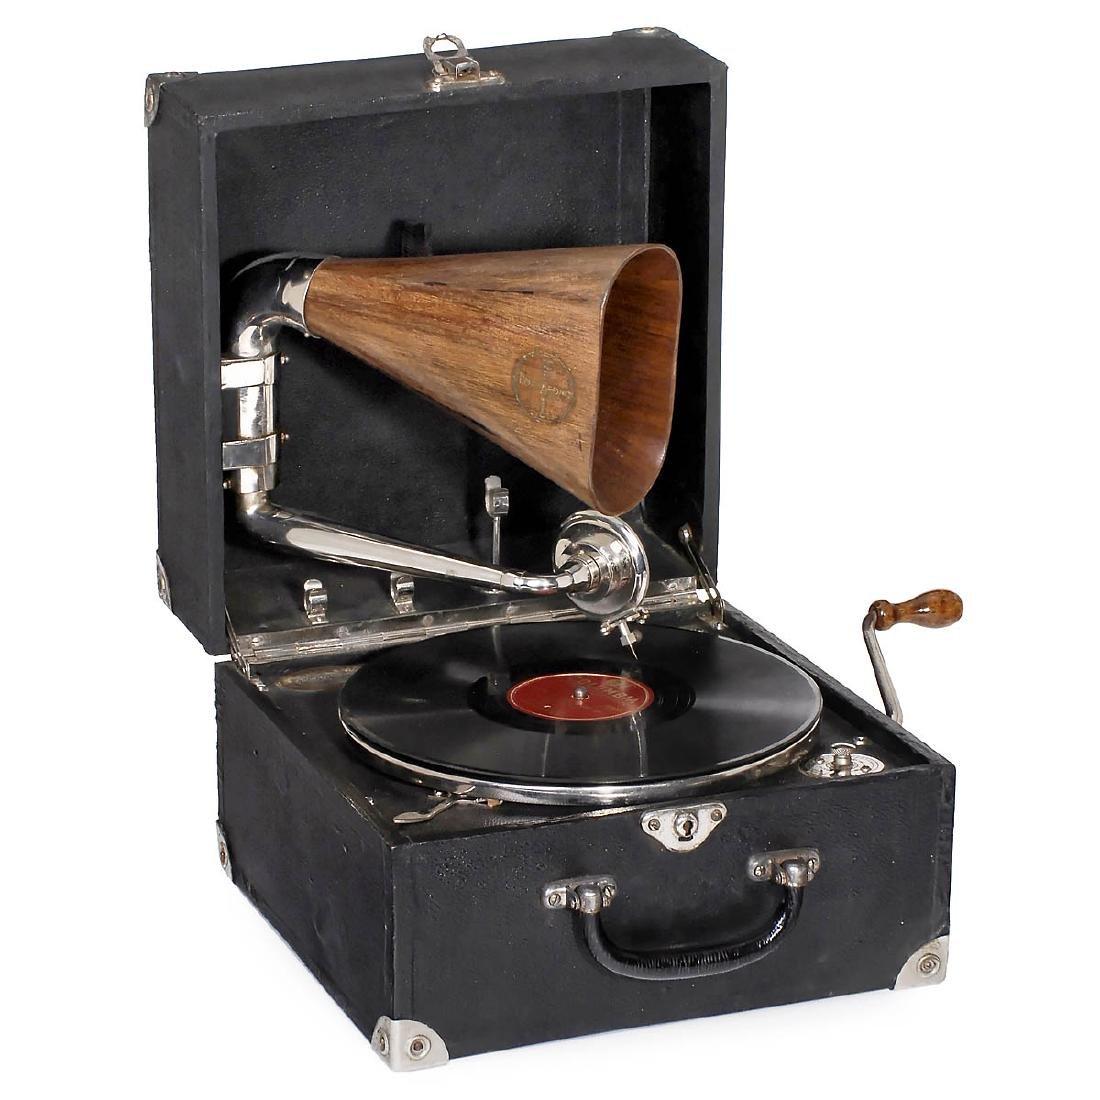 Portafono Duplex Gramophone, c. 1920